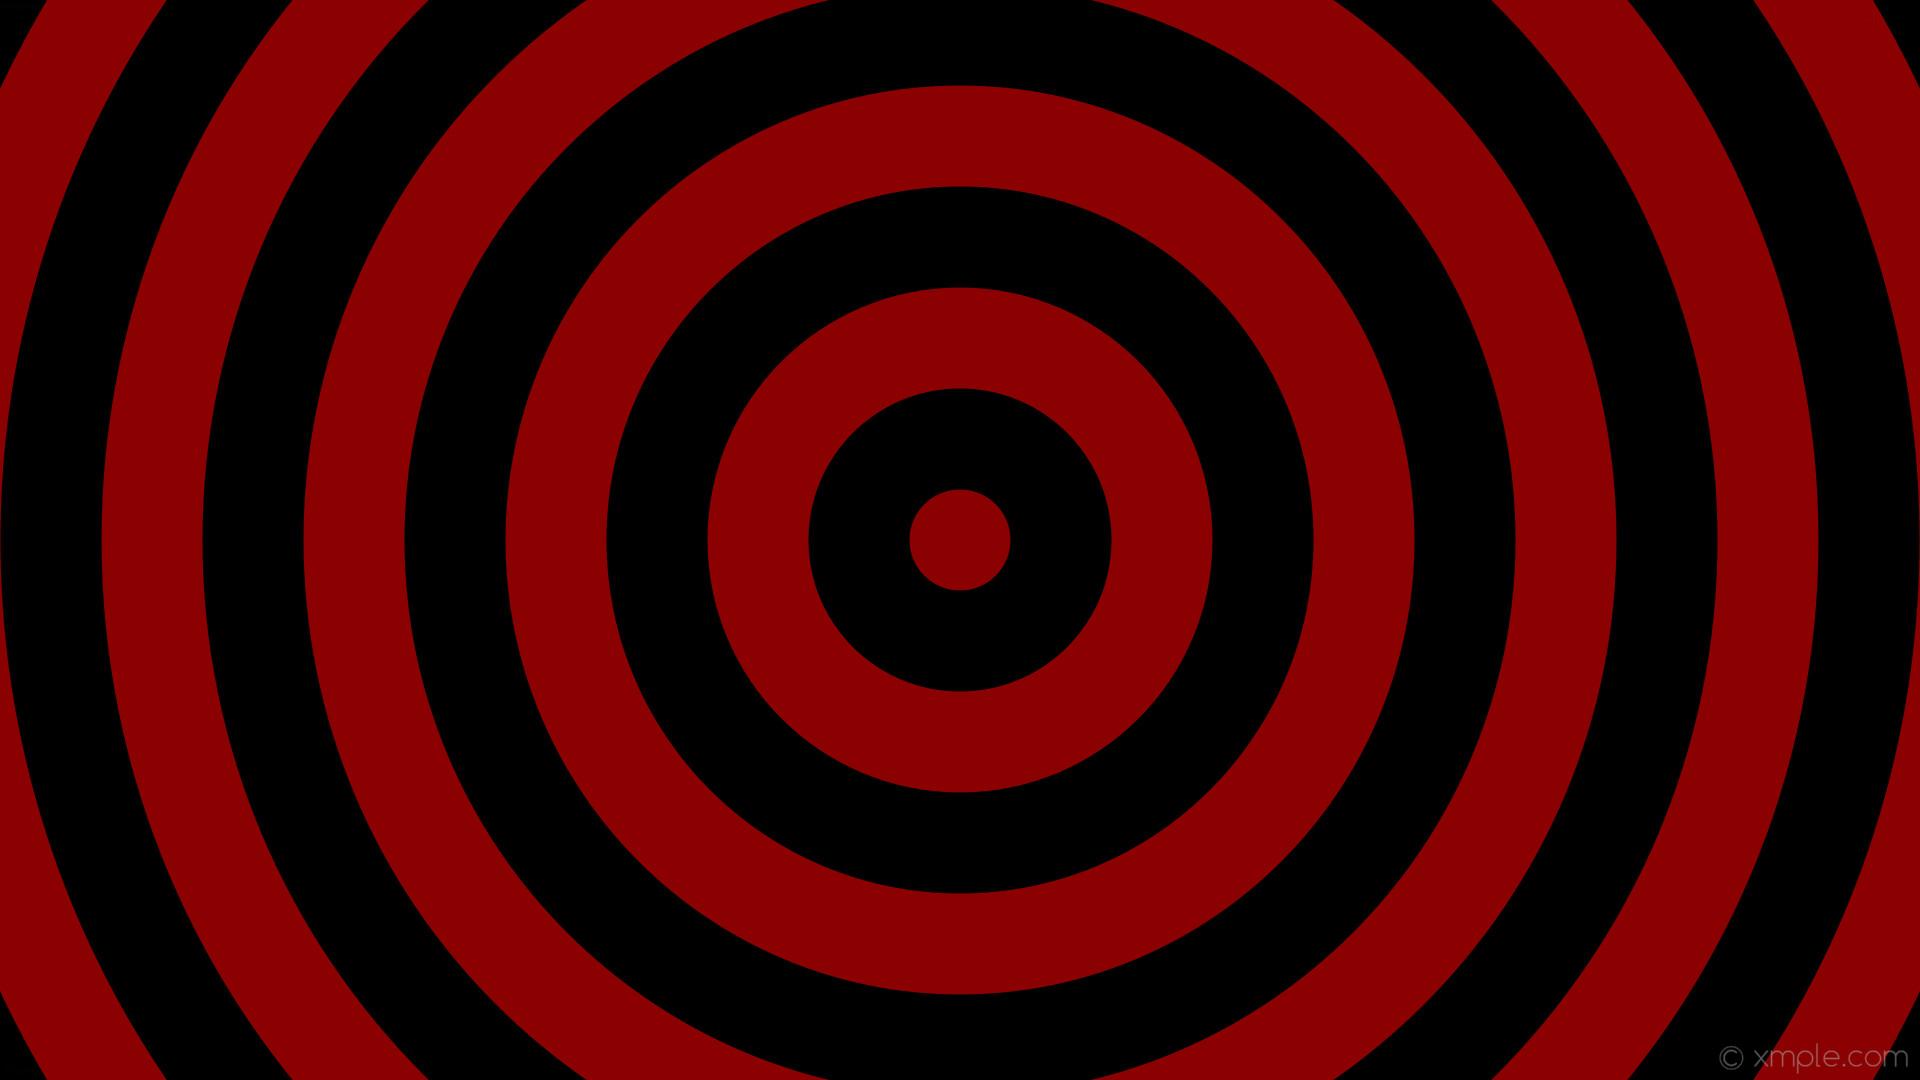 wallpaper circles black concentric drop shadow rings red dark red #000000  #8b0000 19 12